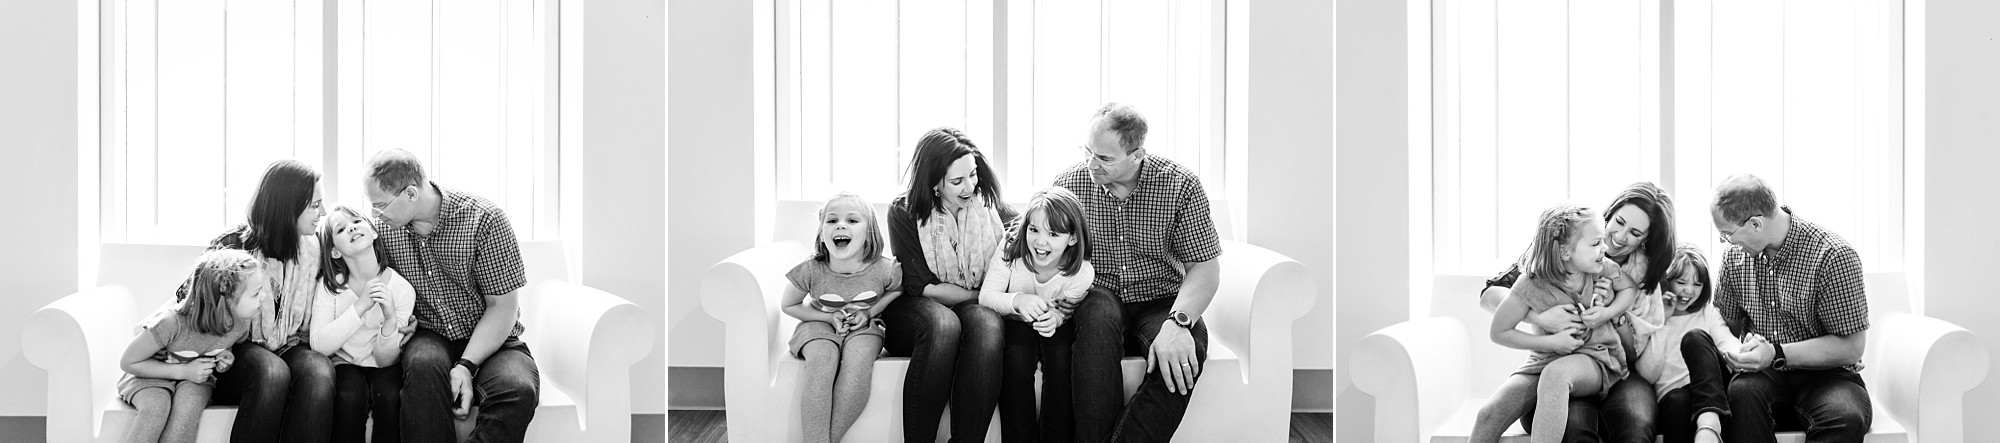 Family_Travel_Photography_Hunnicutt_Photography_0035.jpg